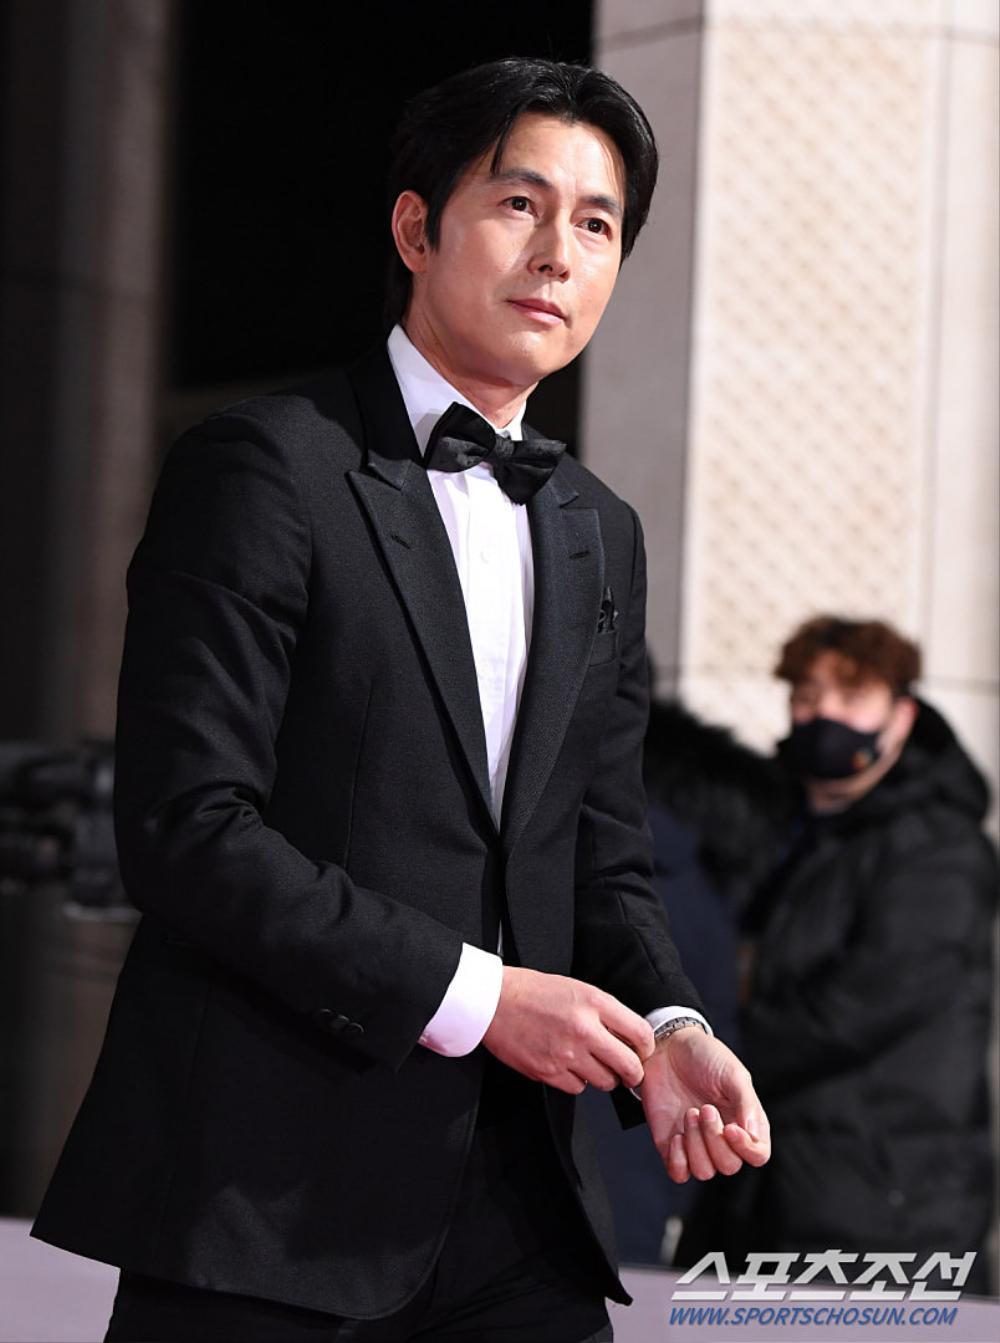 Thảm đỏ 'Rồng xanh 2020': Shin Hye Sun 'cân sắc' Shin Min Ah, Jung Woo Sung - Lee Byung Hun điển trai! Ảnh 8